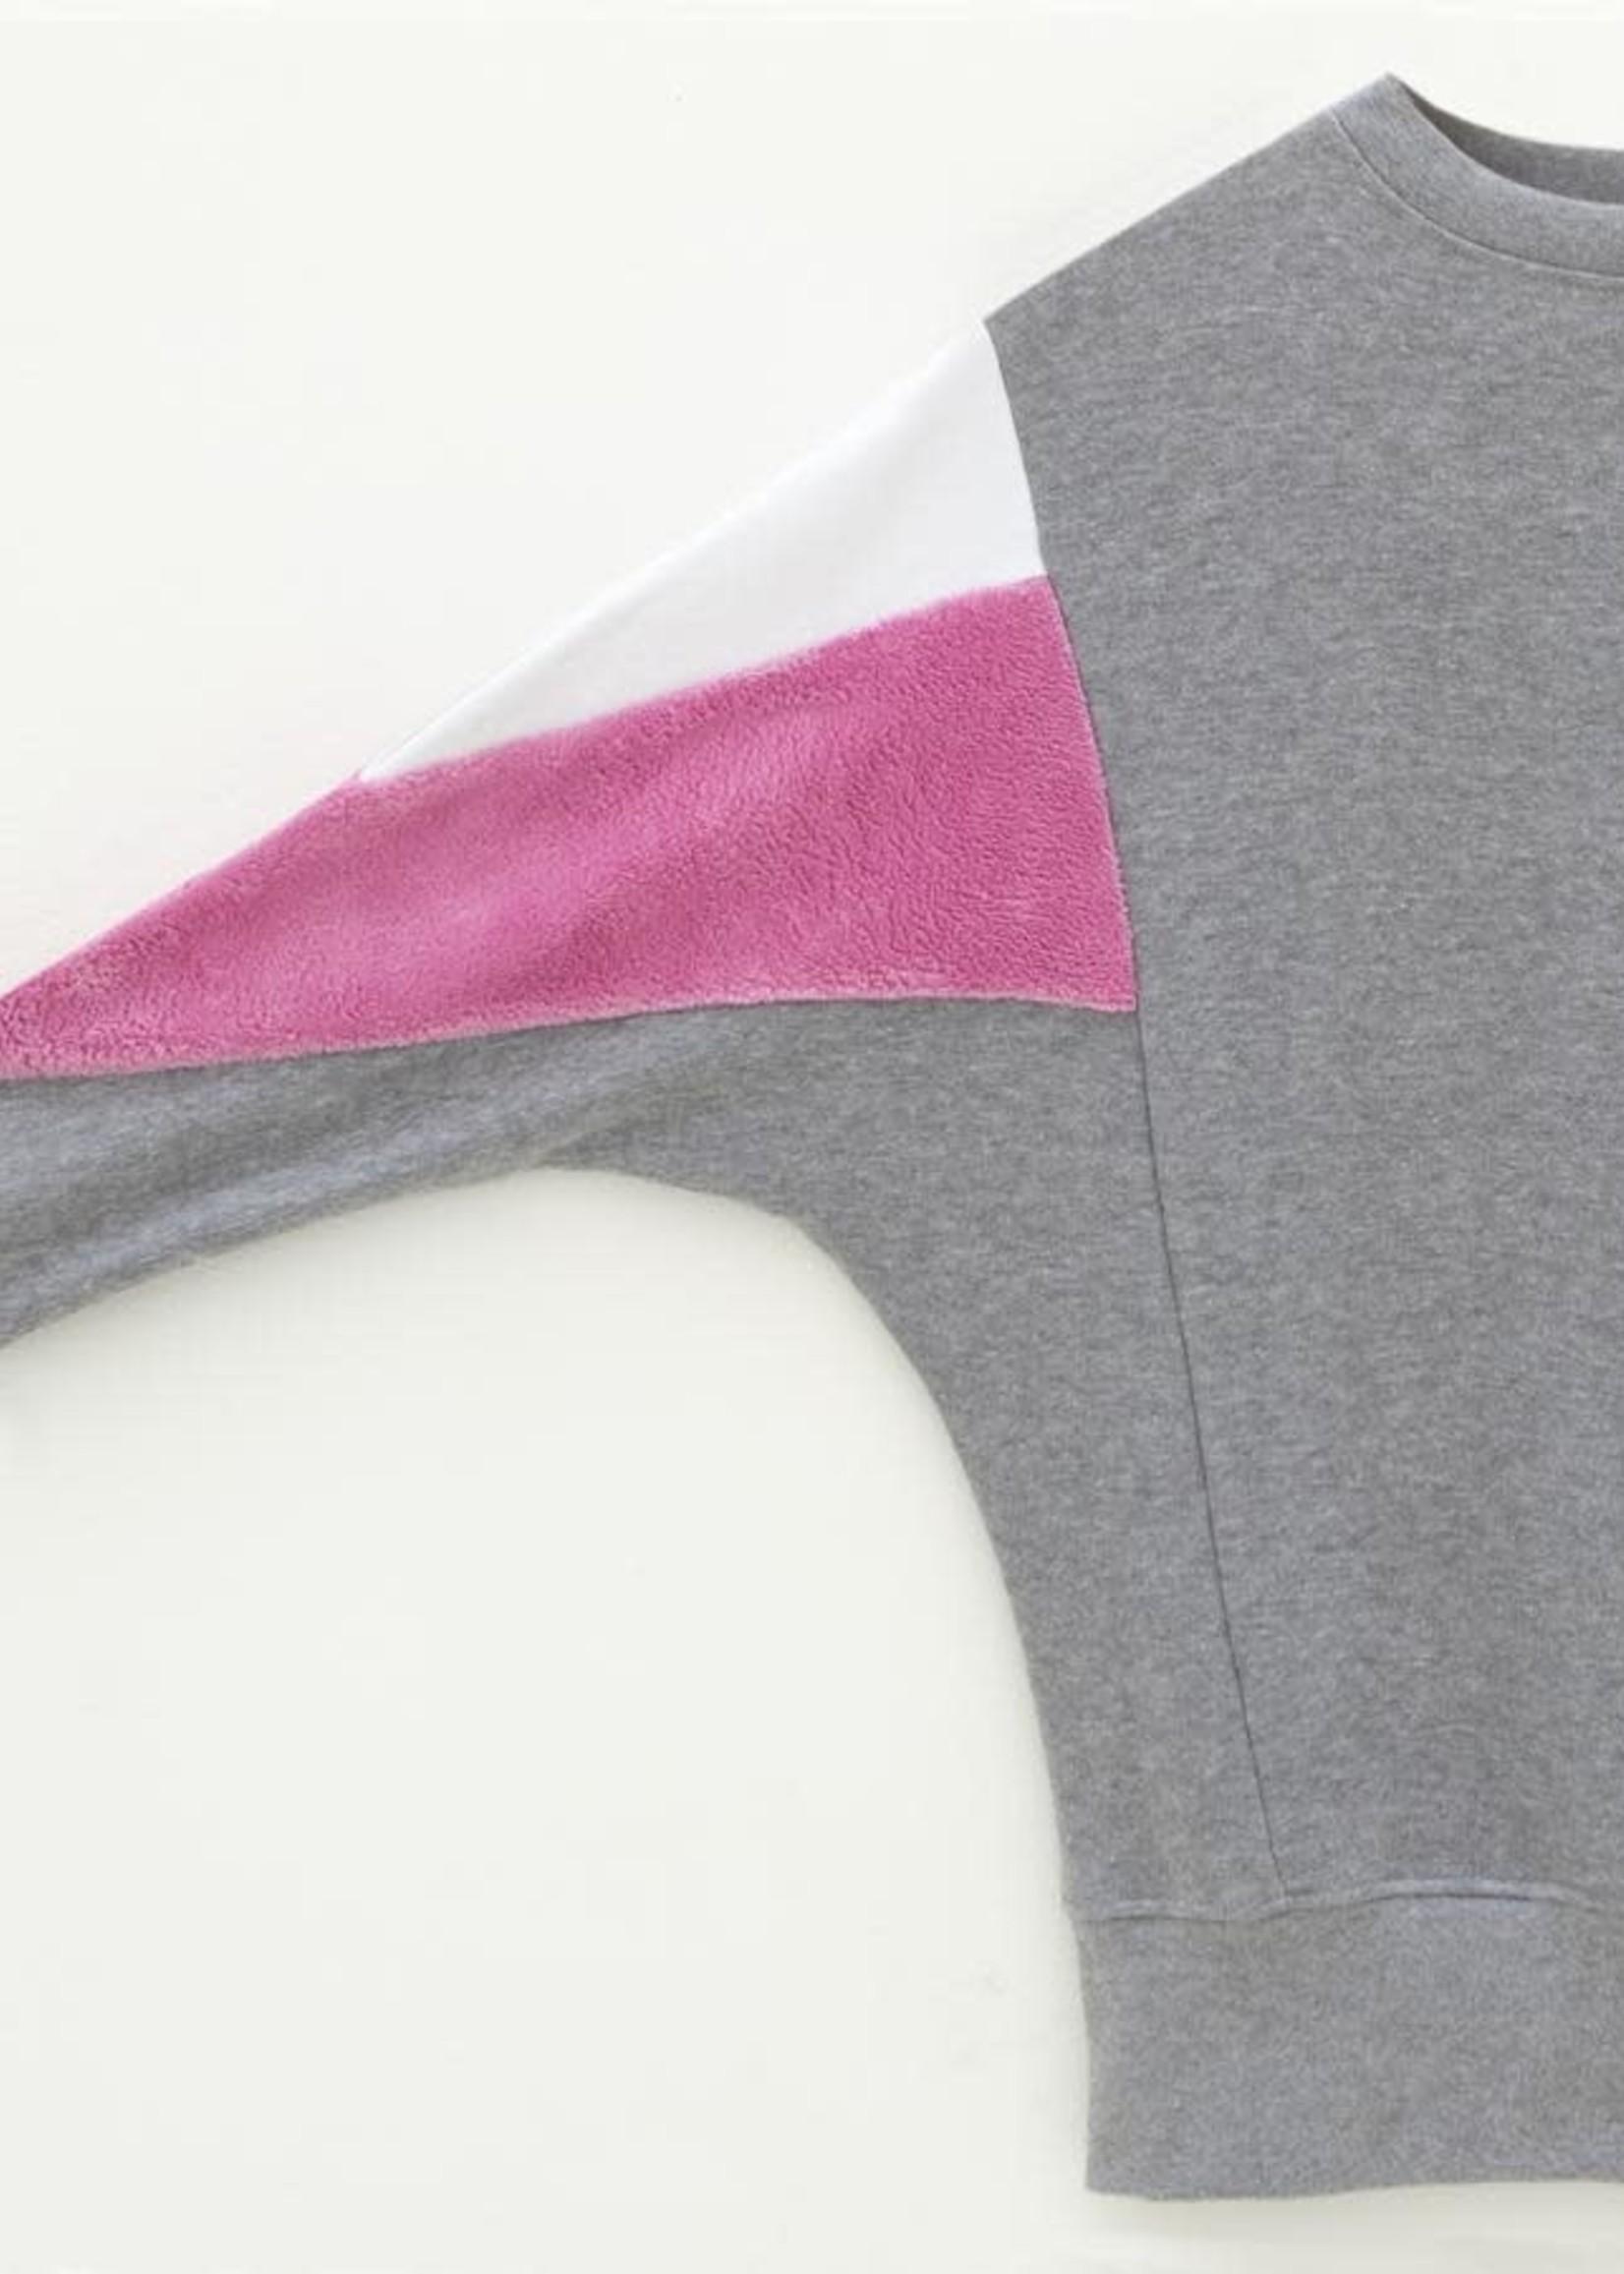 The Driftwood Tales The Driftwood Tales - Sweatshirt-AMY - gemaakt van 4 verschillende gerecyclede  stoffen- wit,donker roze, grijs